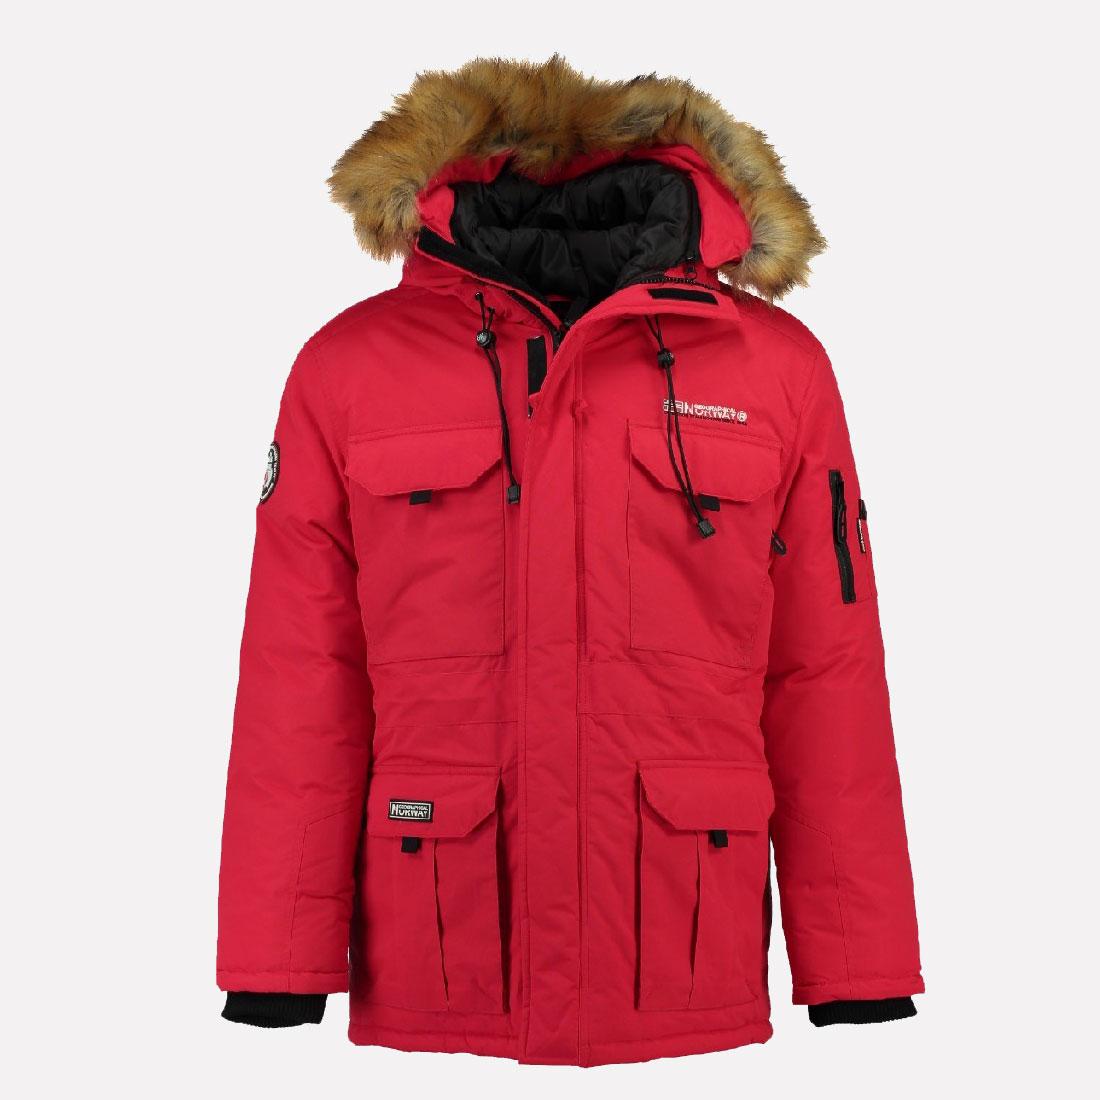 Geographical Norway Men's Parka Outdoor Coat Very Warm ...